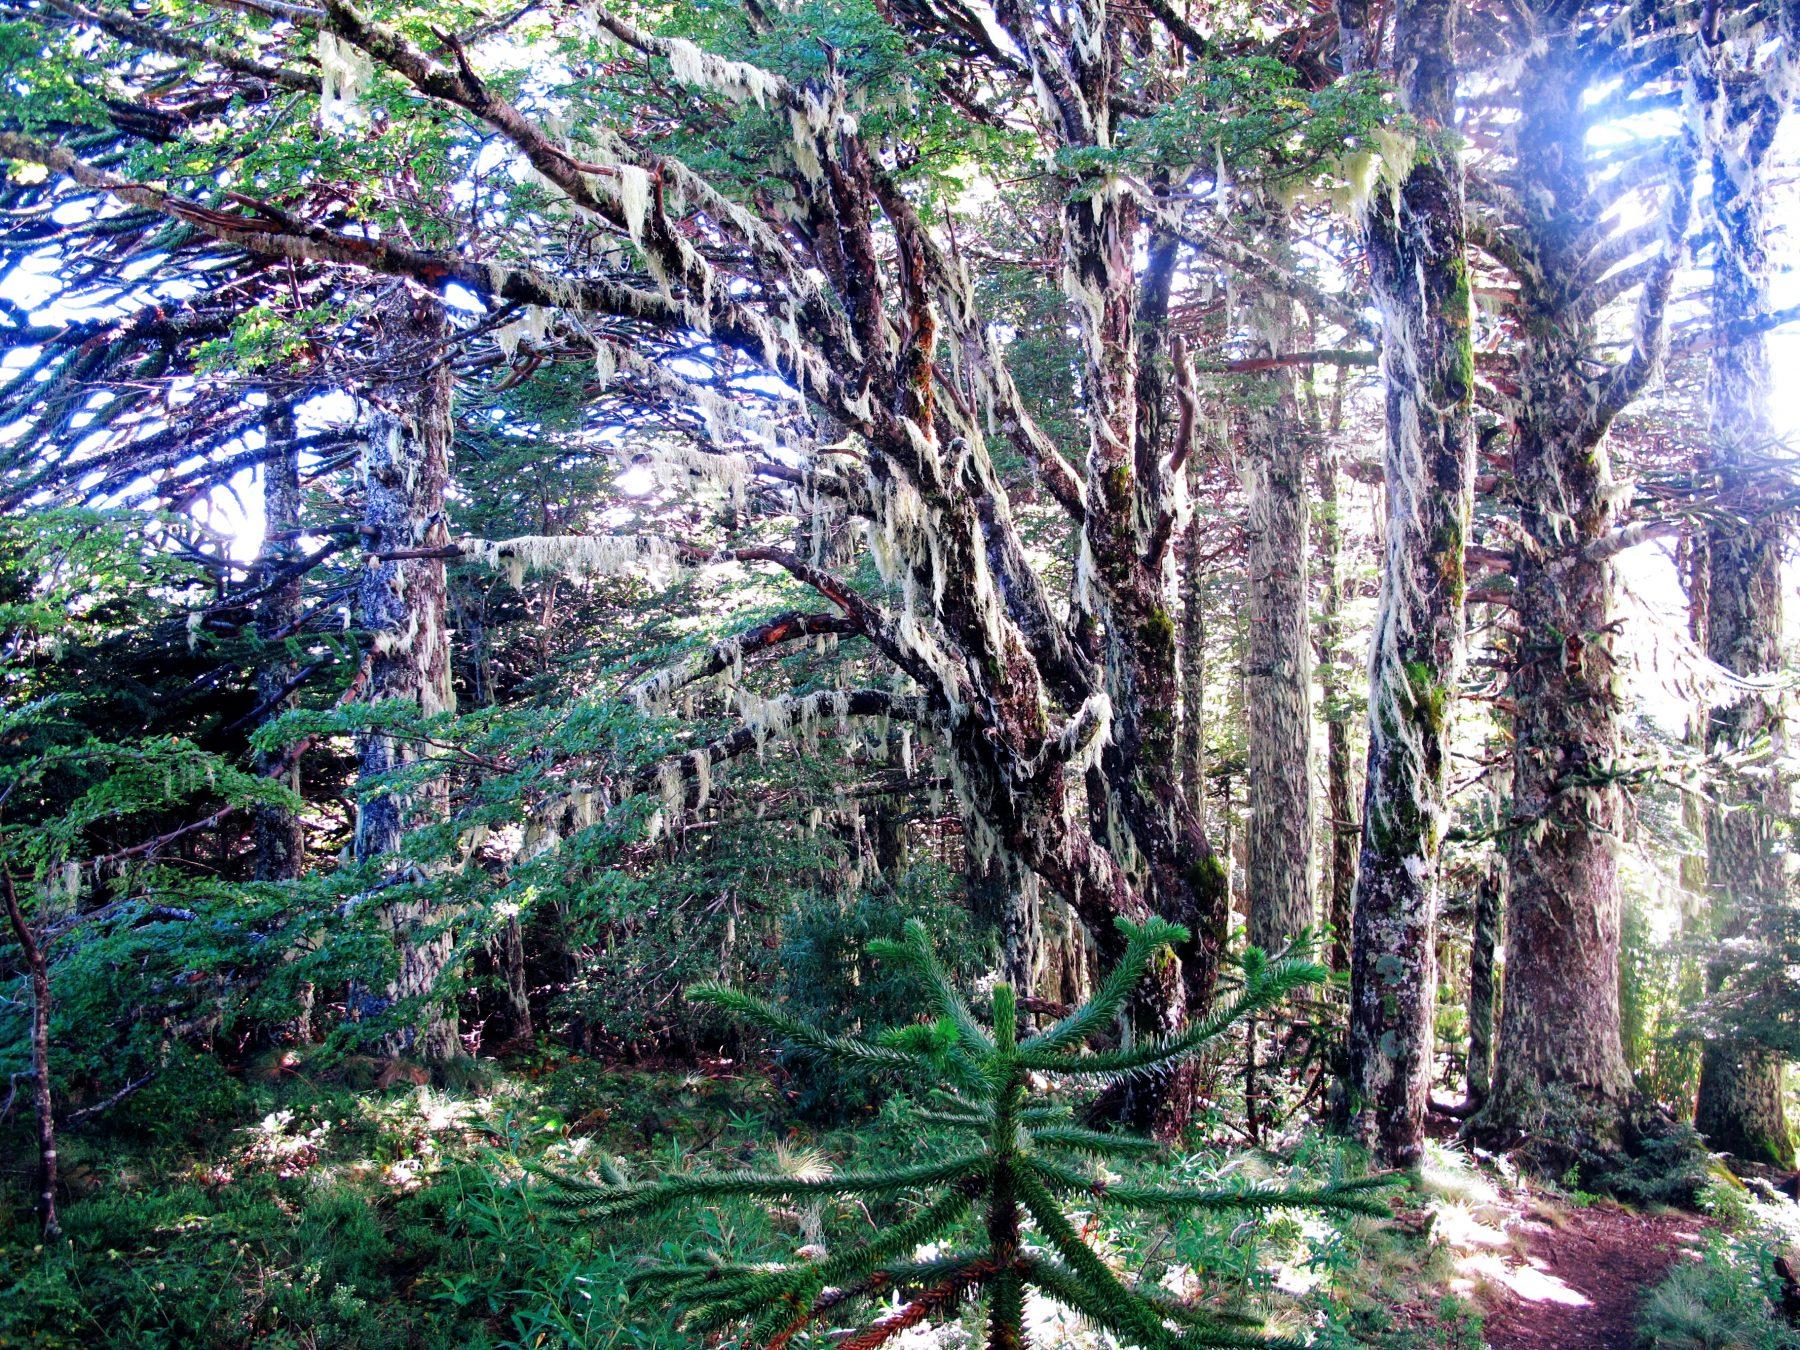 les arbres millénaires du parc Huerquehue